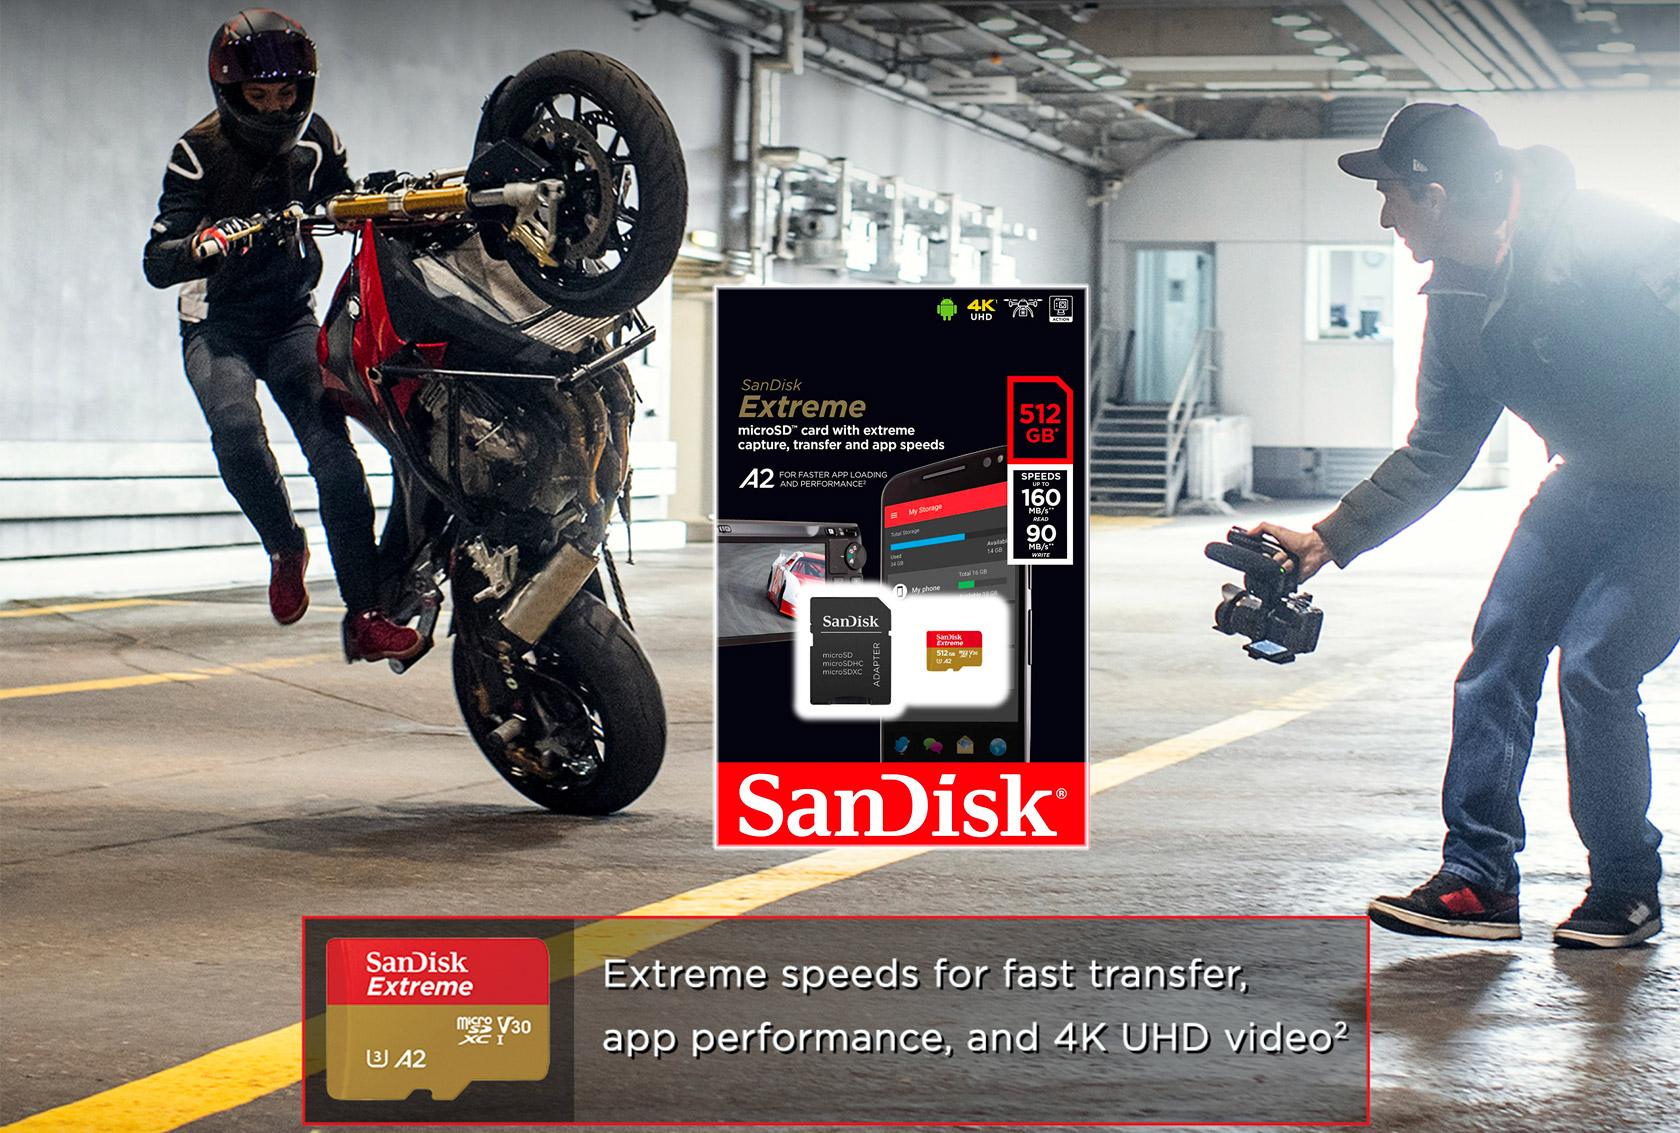 SanDisk 512GB Extreme MicroSD